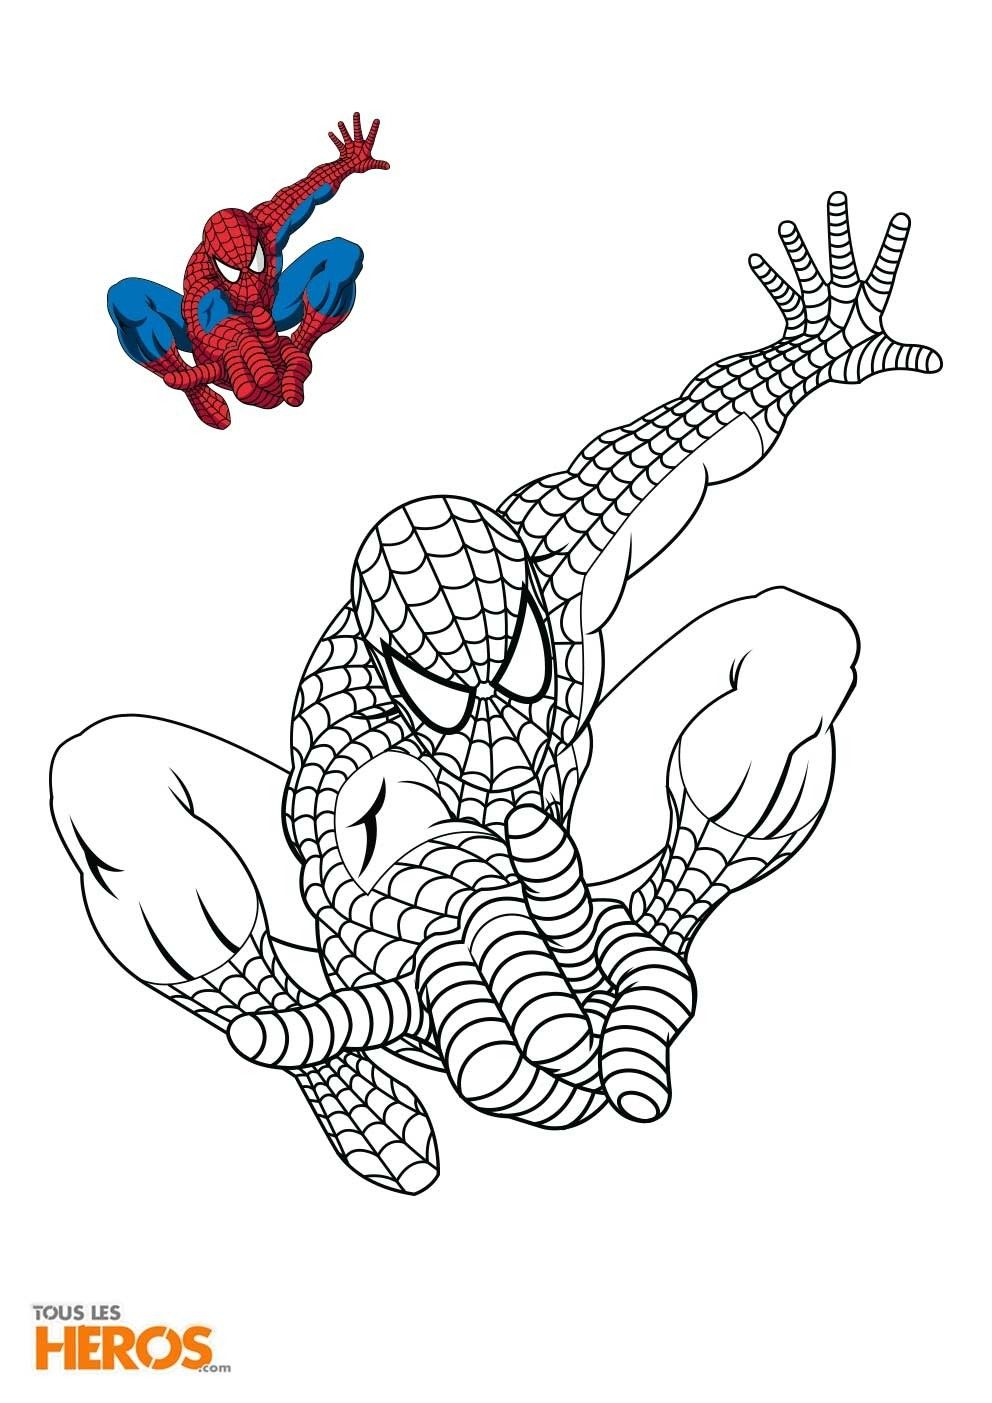 Coloriage A Imprime Spiderman  Spiderman coloring, Marvel